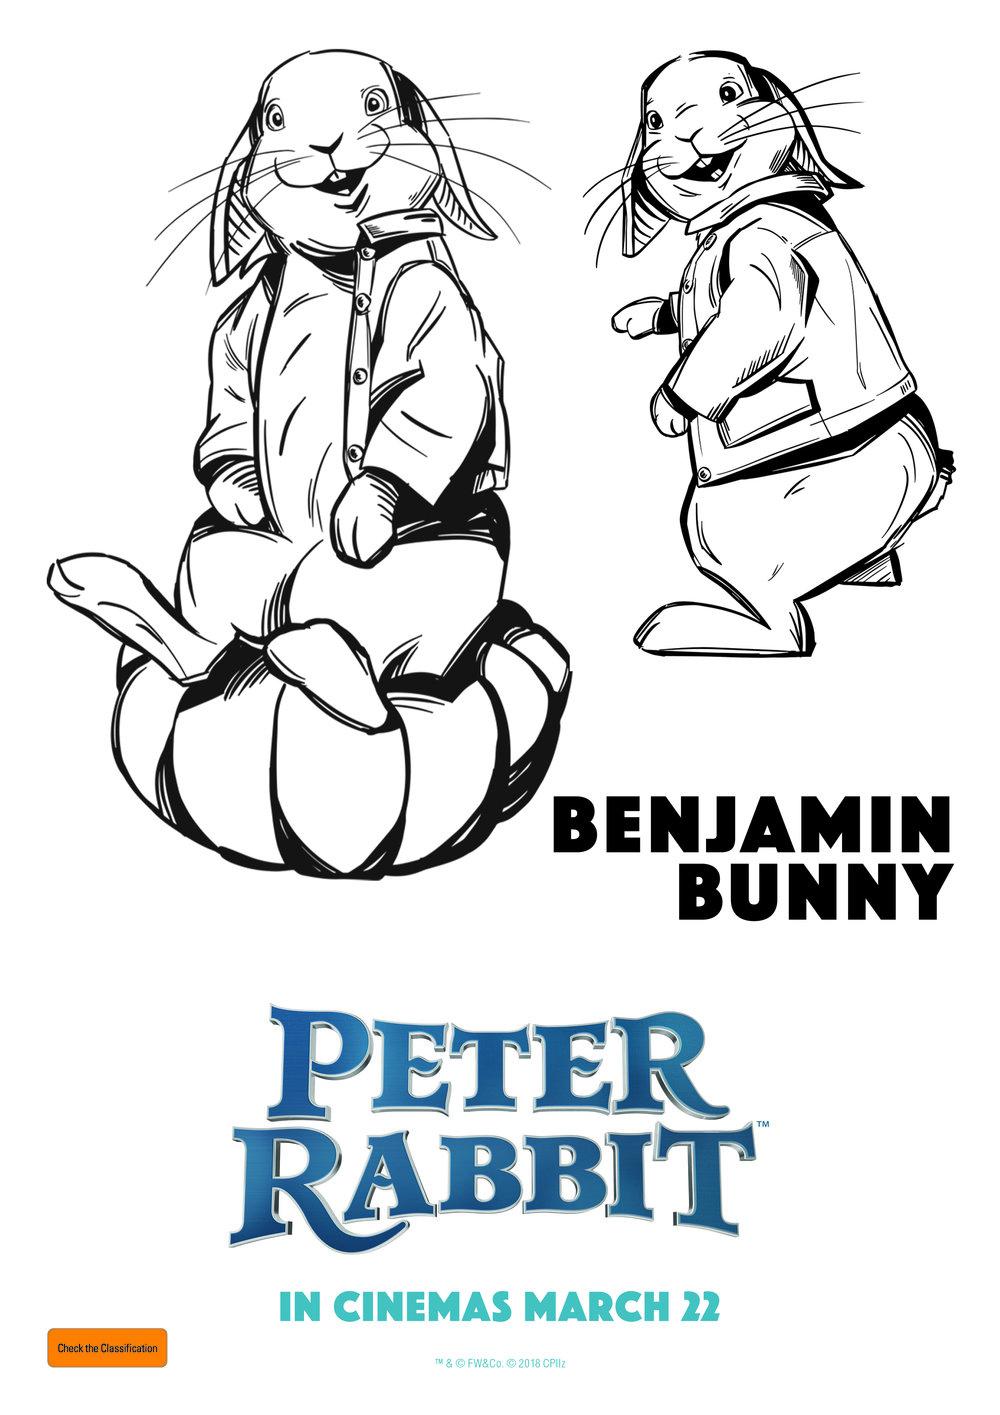 Benjamin Bunny - Colouring In Sheet